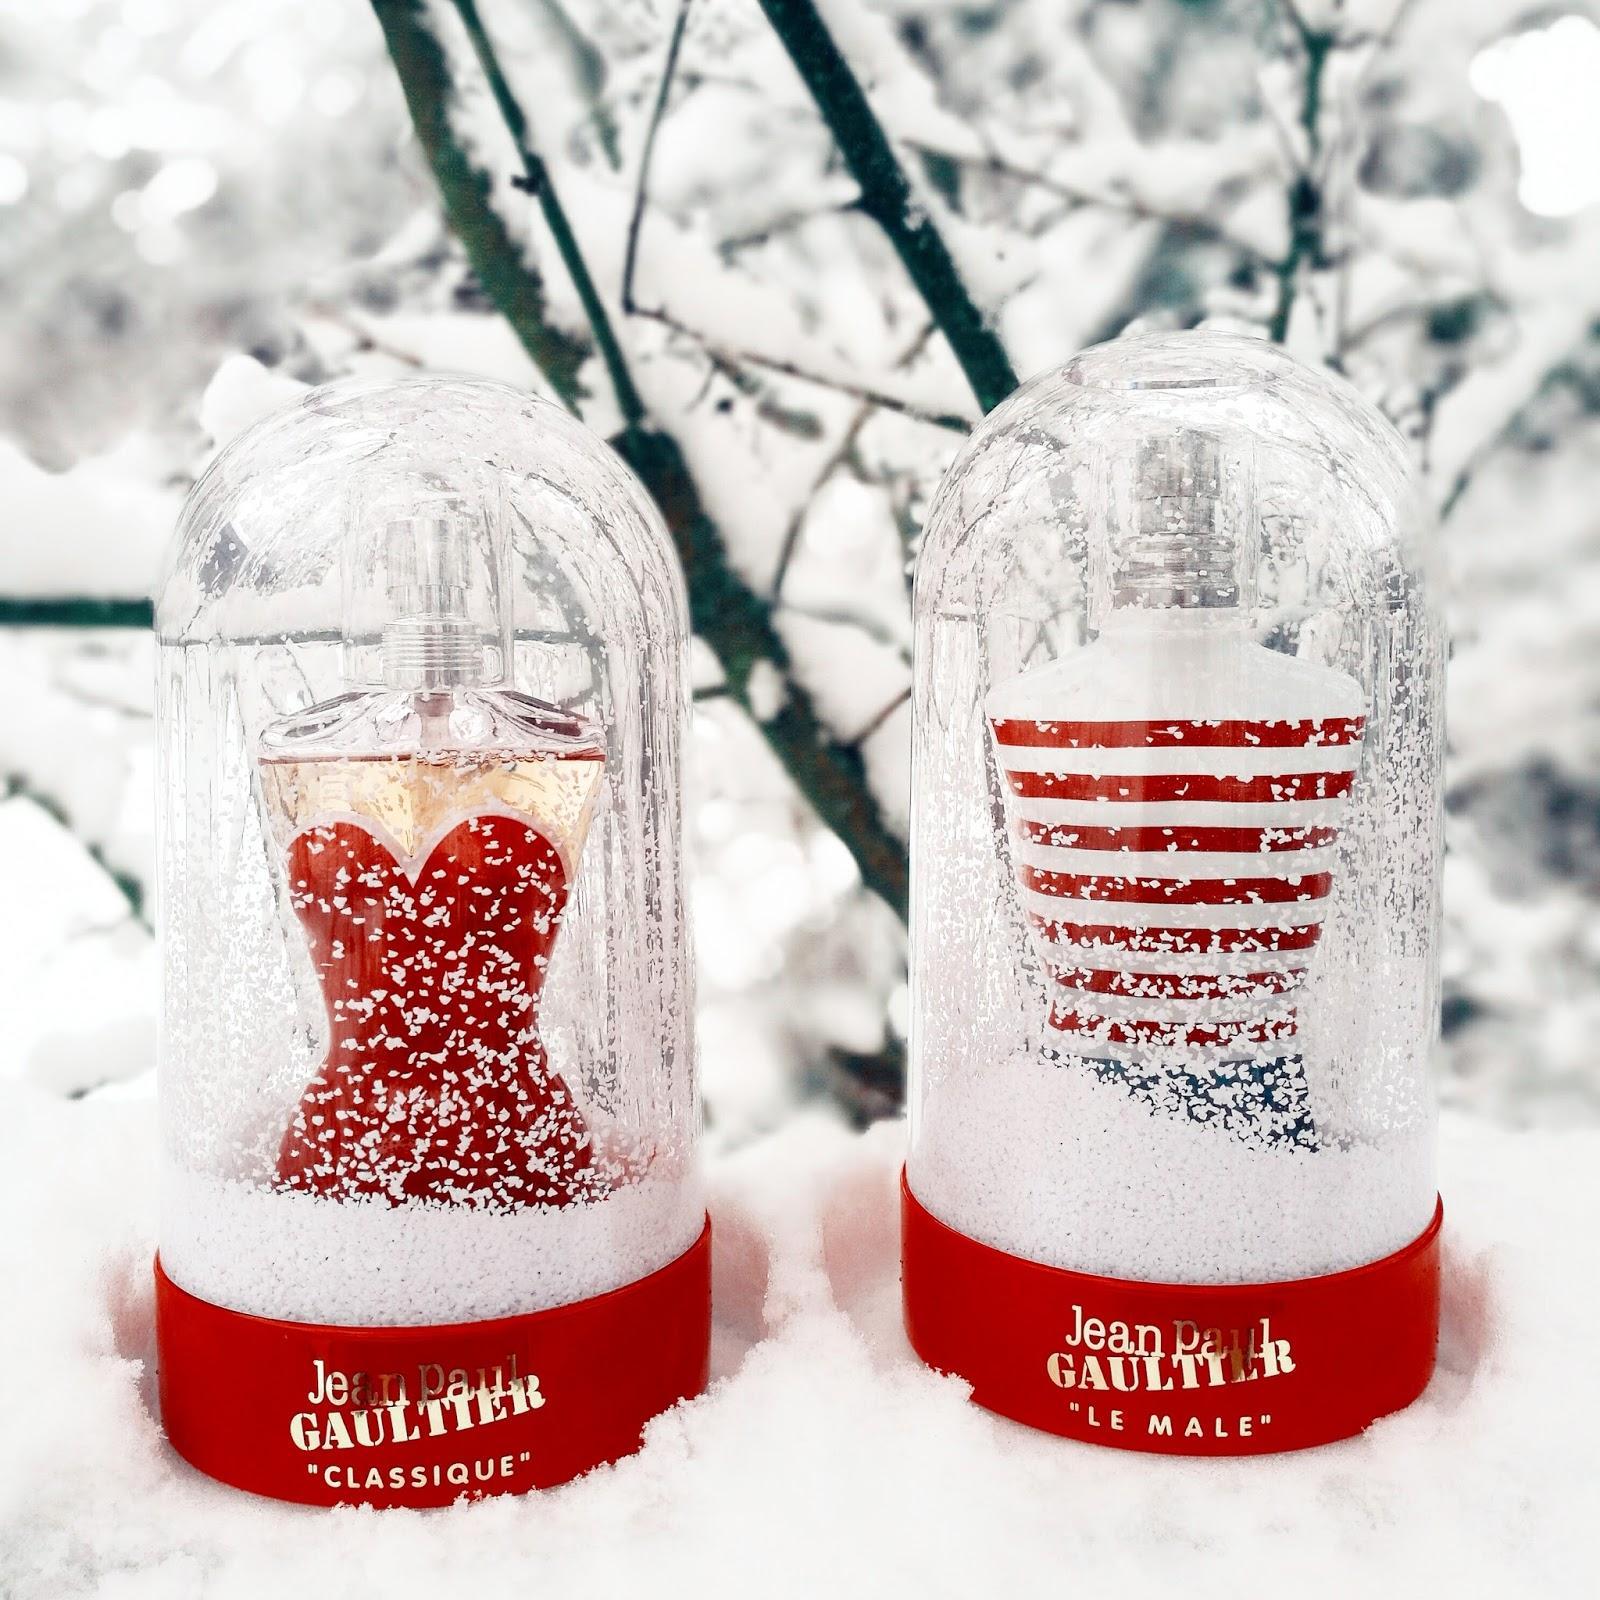 Talvi saapui Porvooseen ja Jean Paul Gaultier Christmas Collector-tuoksut